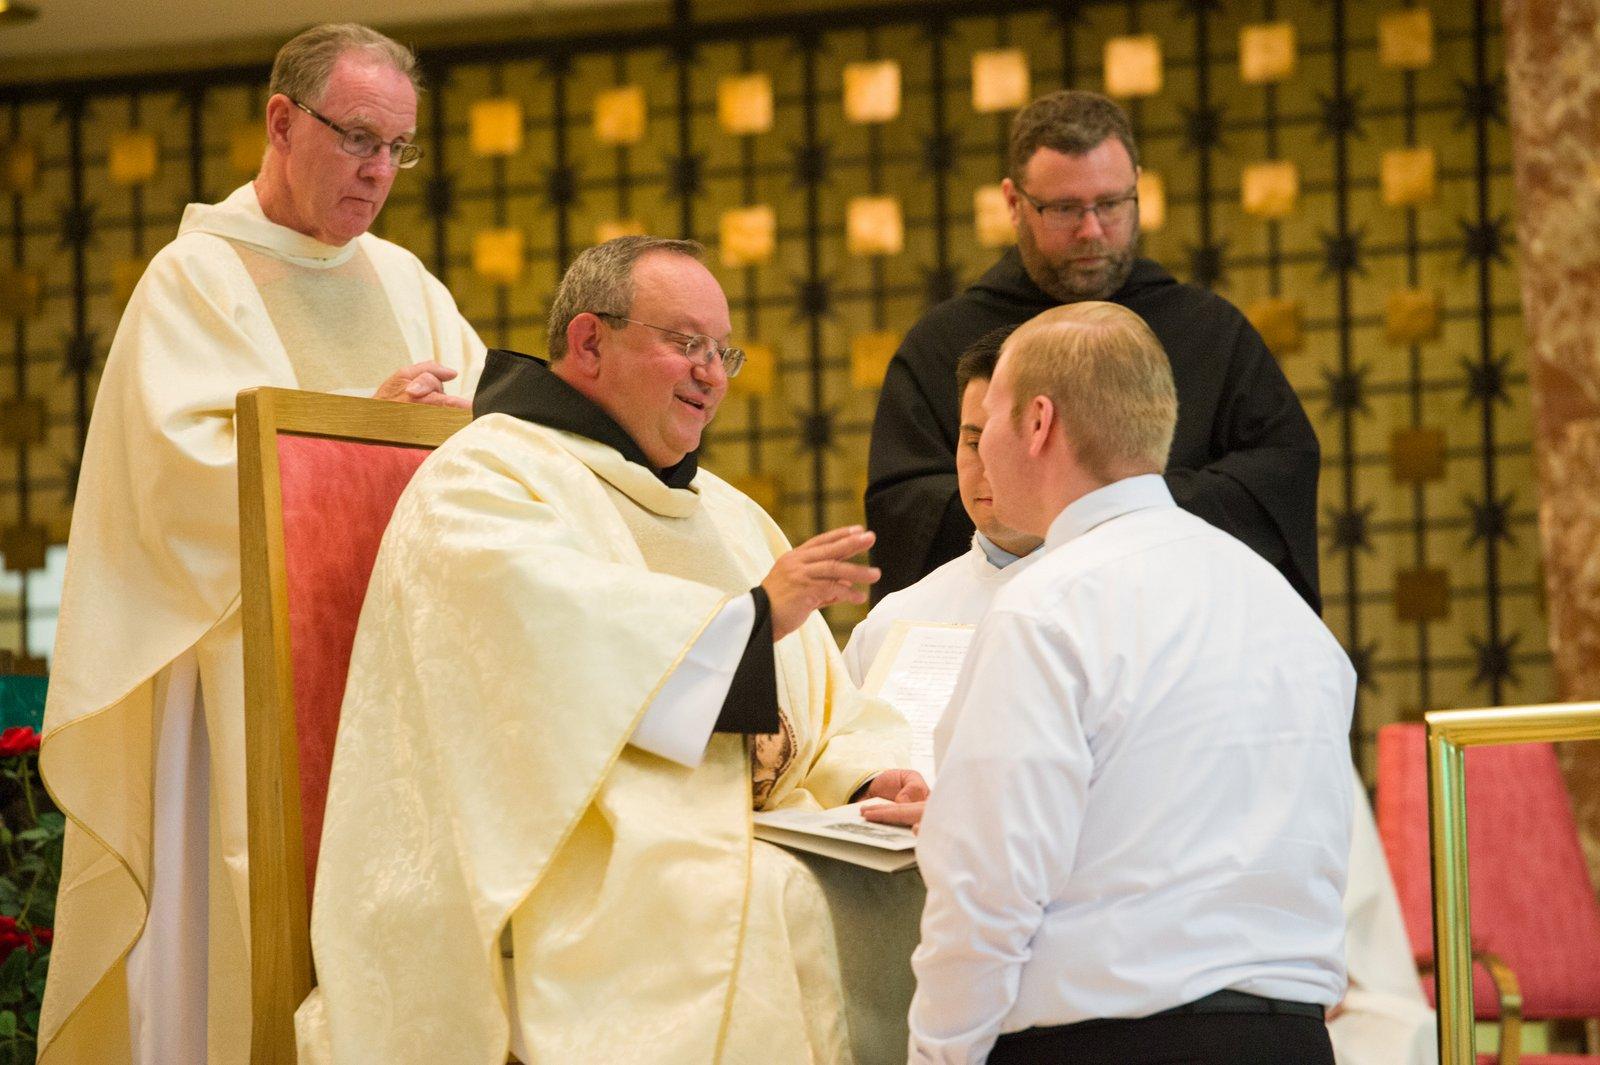 Joe Roccasalva professes his first vows